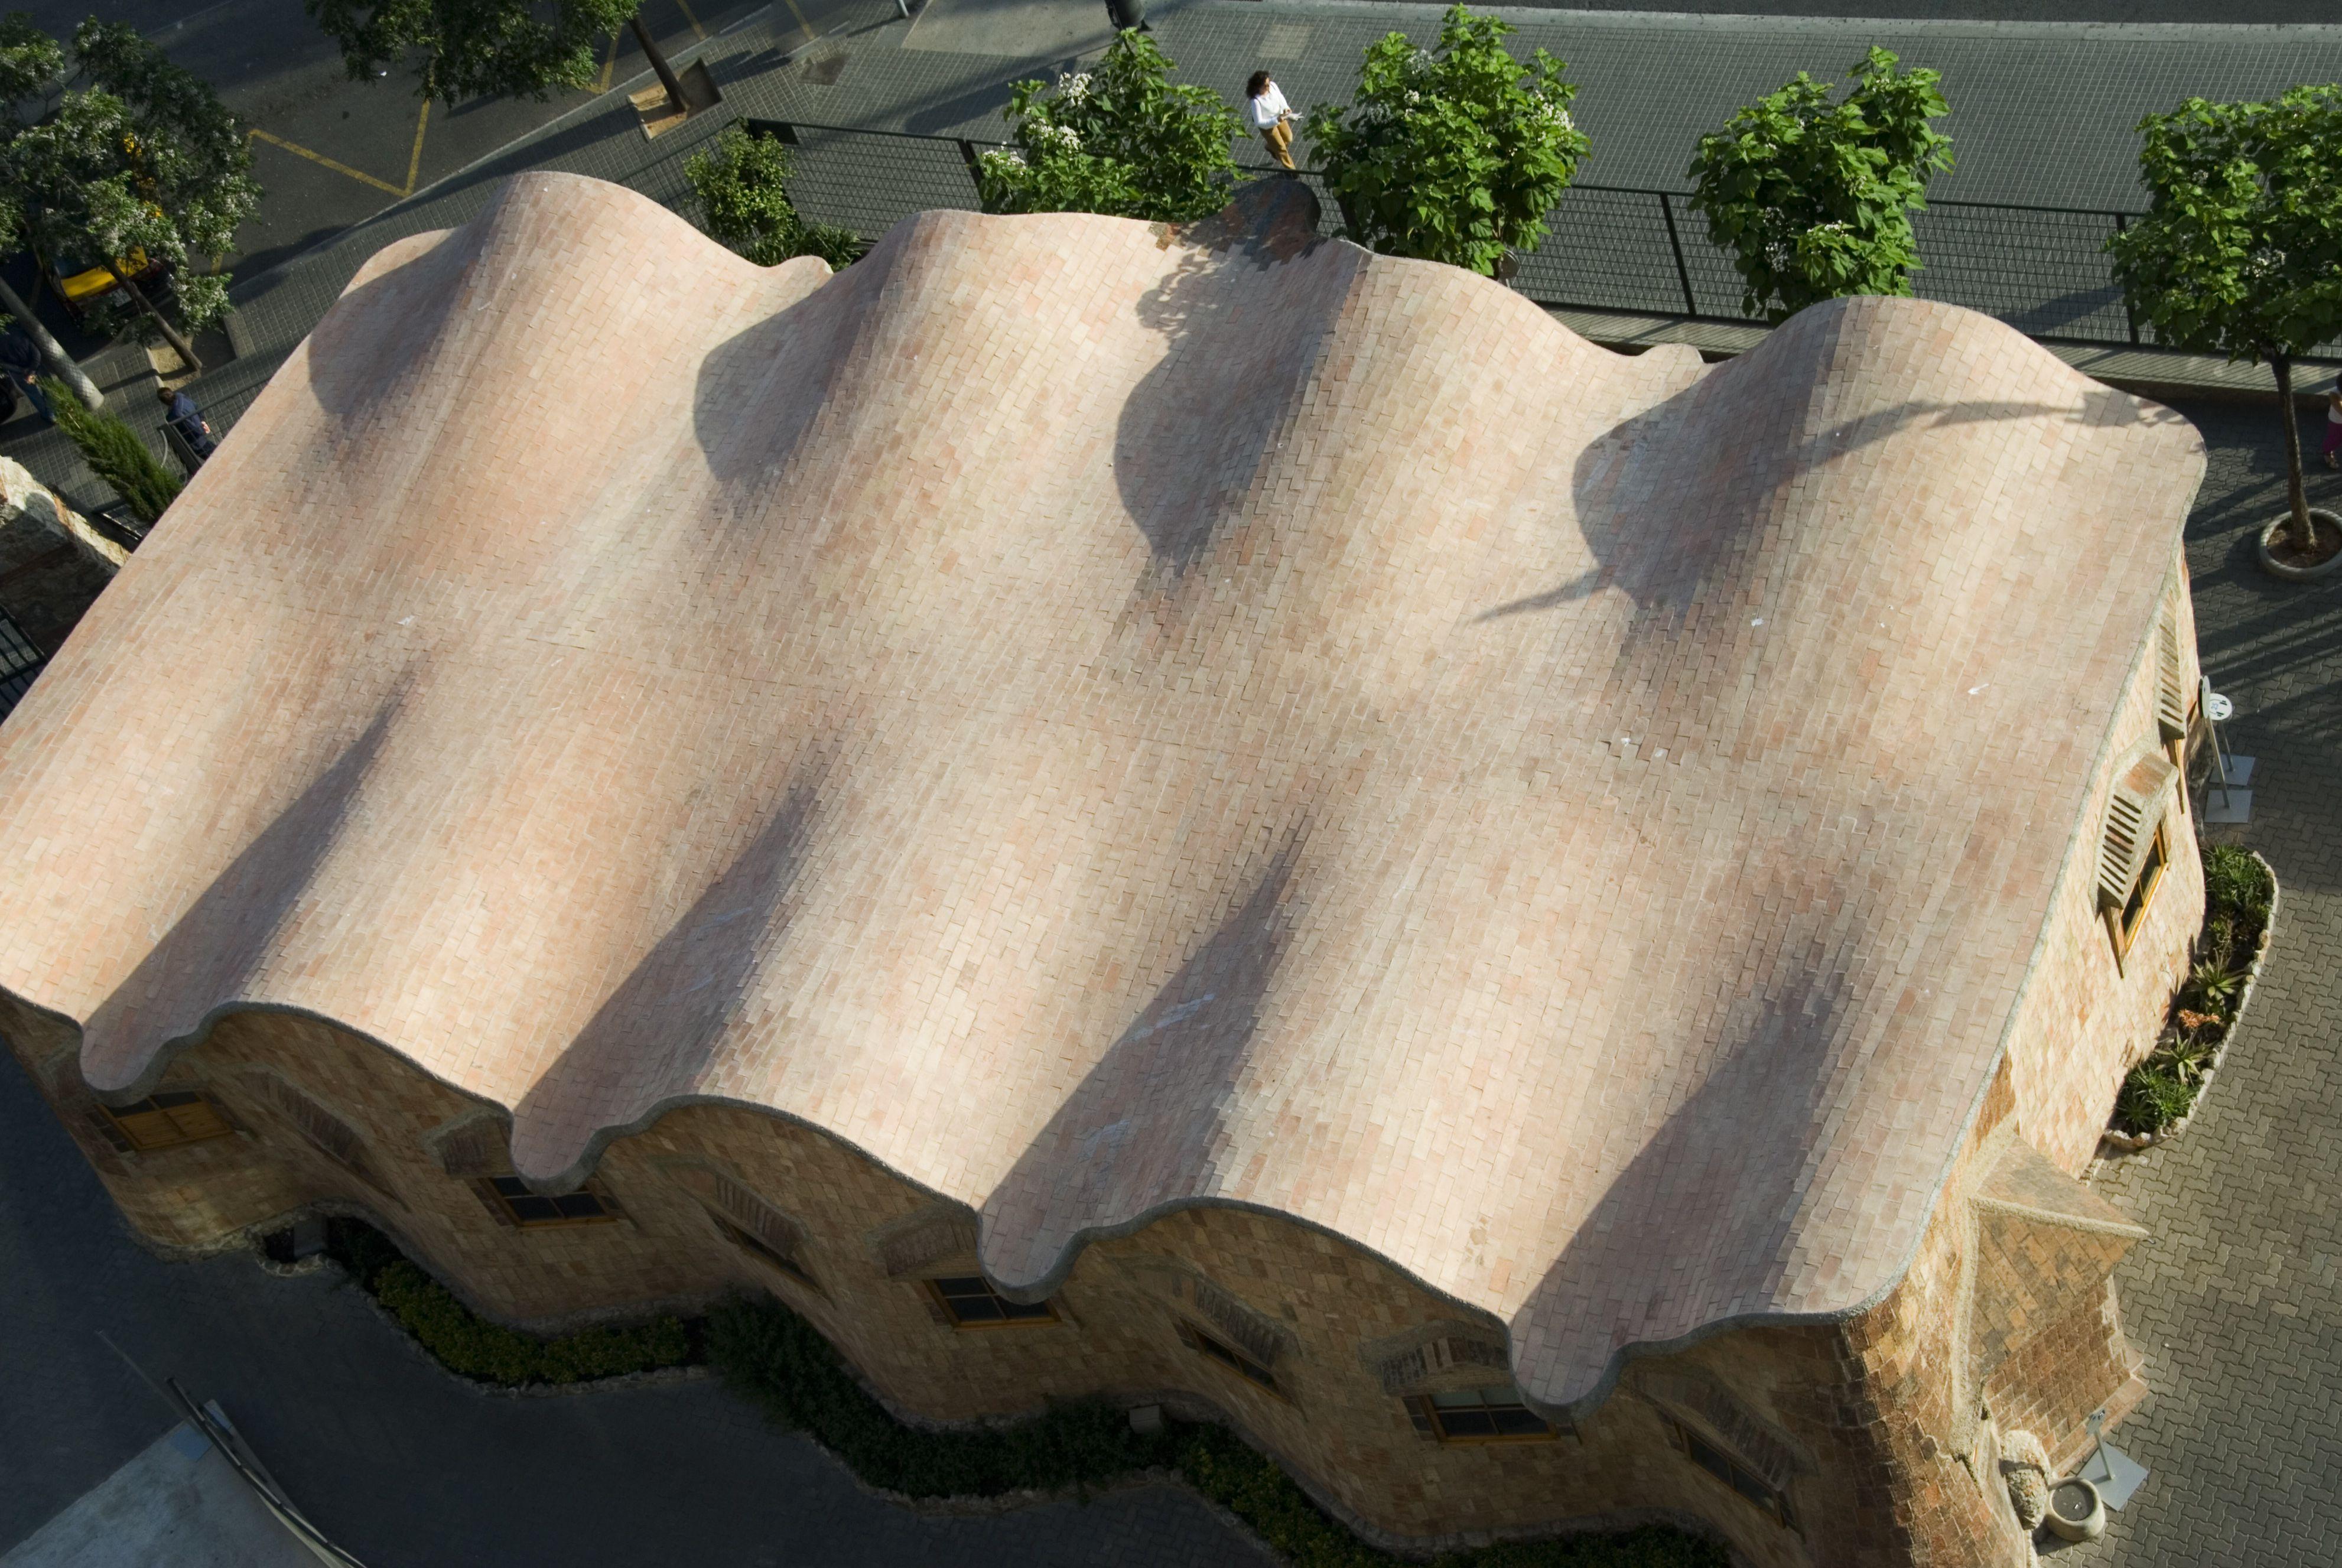 Undulating roof of Sagrada Familia School by Antoni Gaudí in Barcelona, Spain